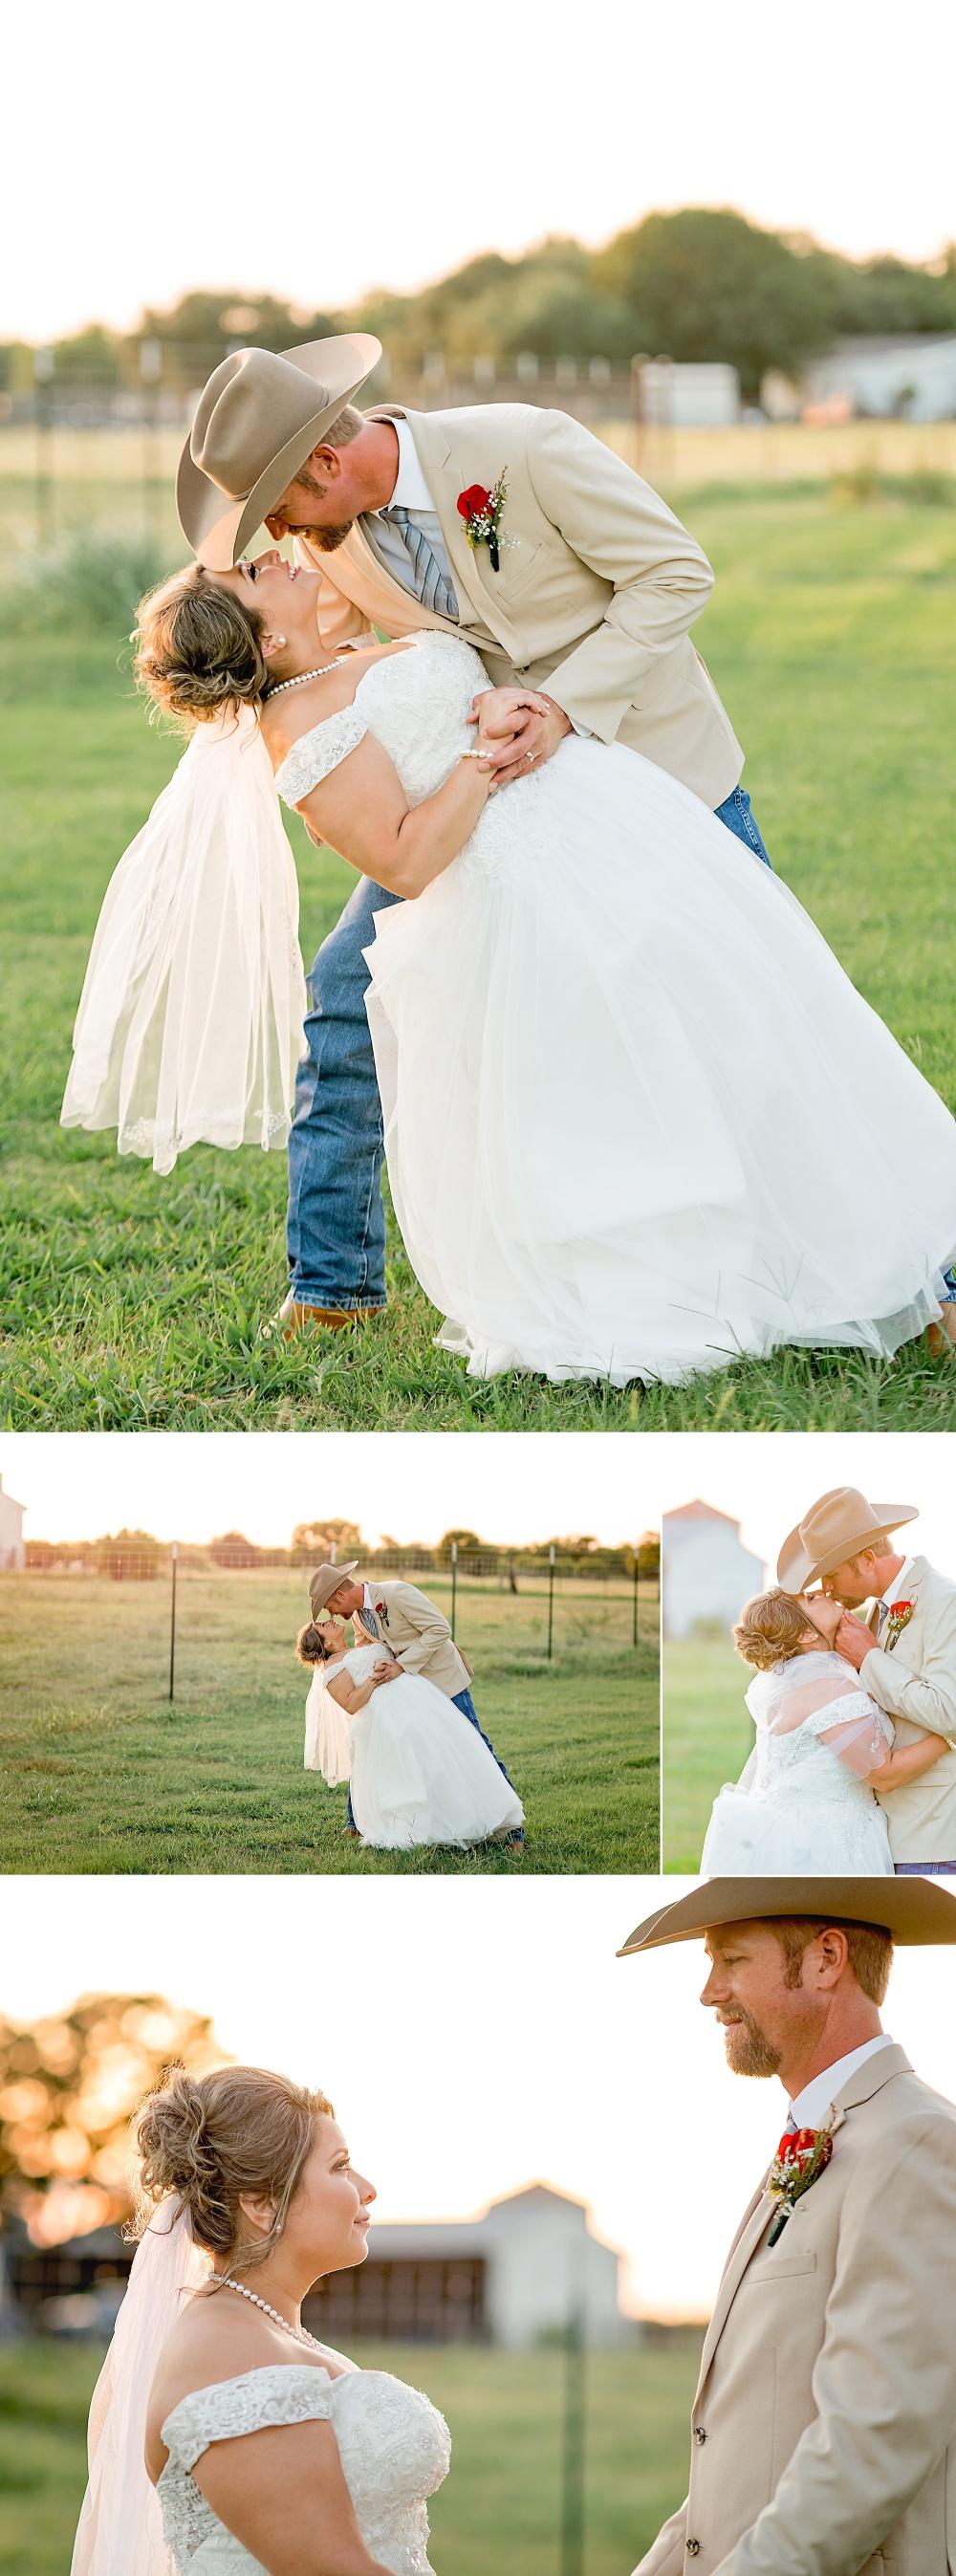 Wedding-Photographer-Rustic-Sunflower-theme-Texas-Carly-Barton-Photography_0119.jpg